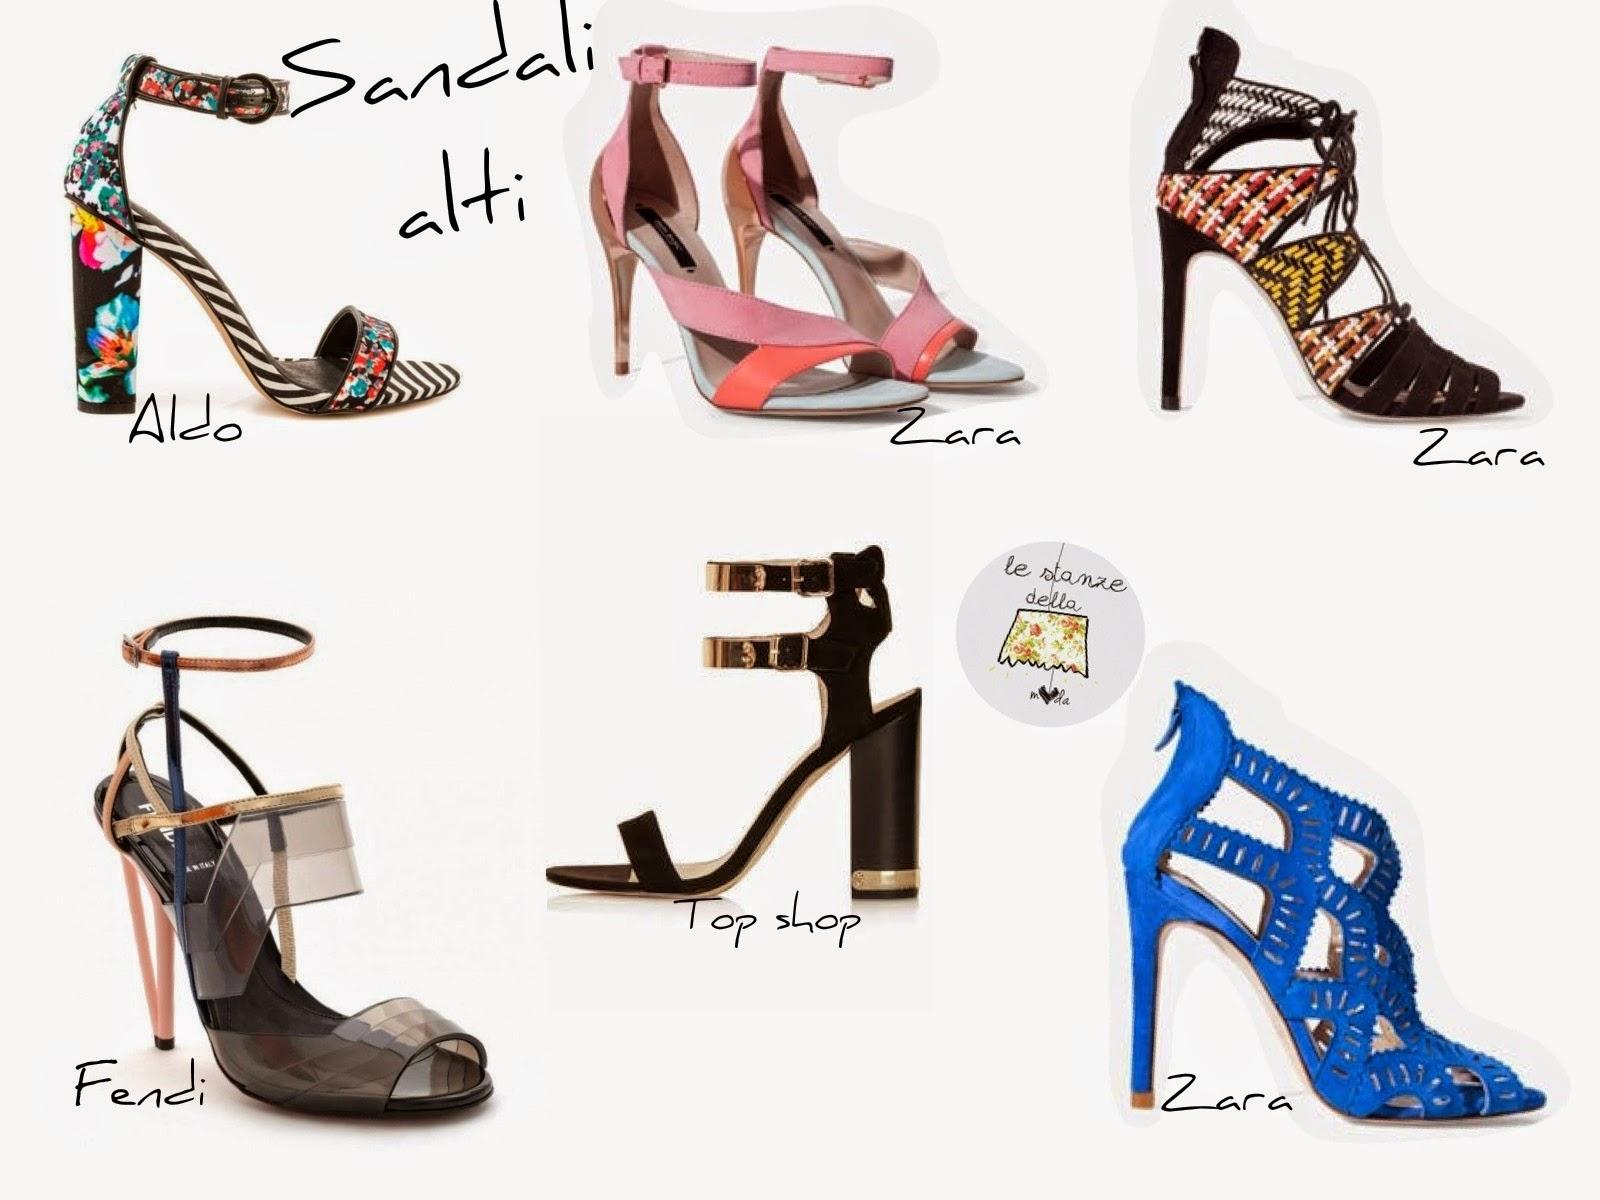 scarpe e scarpe, scarpe 2014 estate, geox scarpe, scarpe 2014